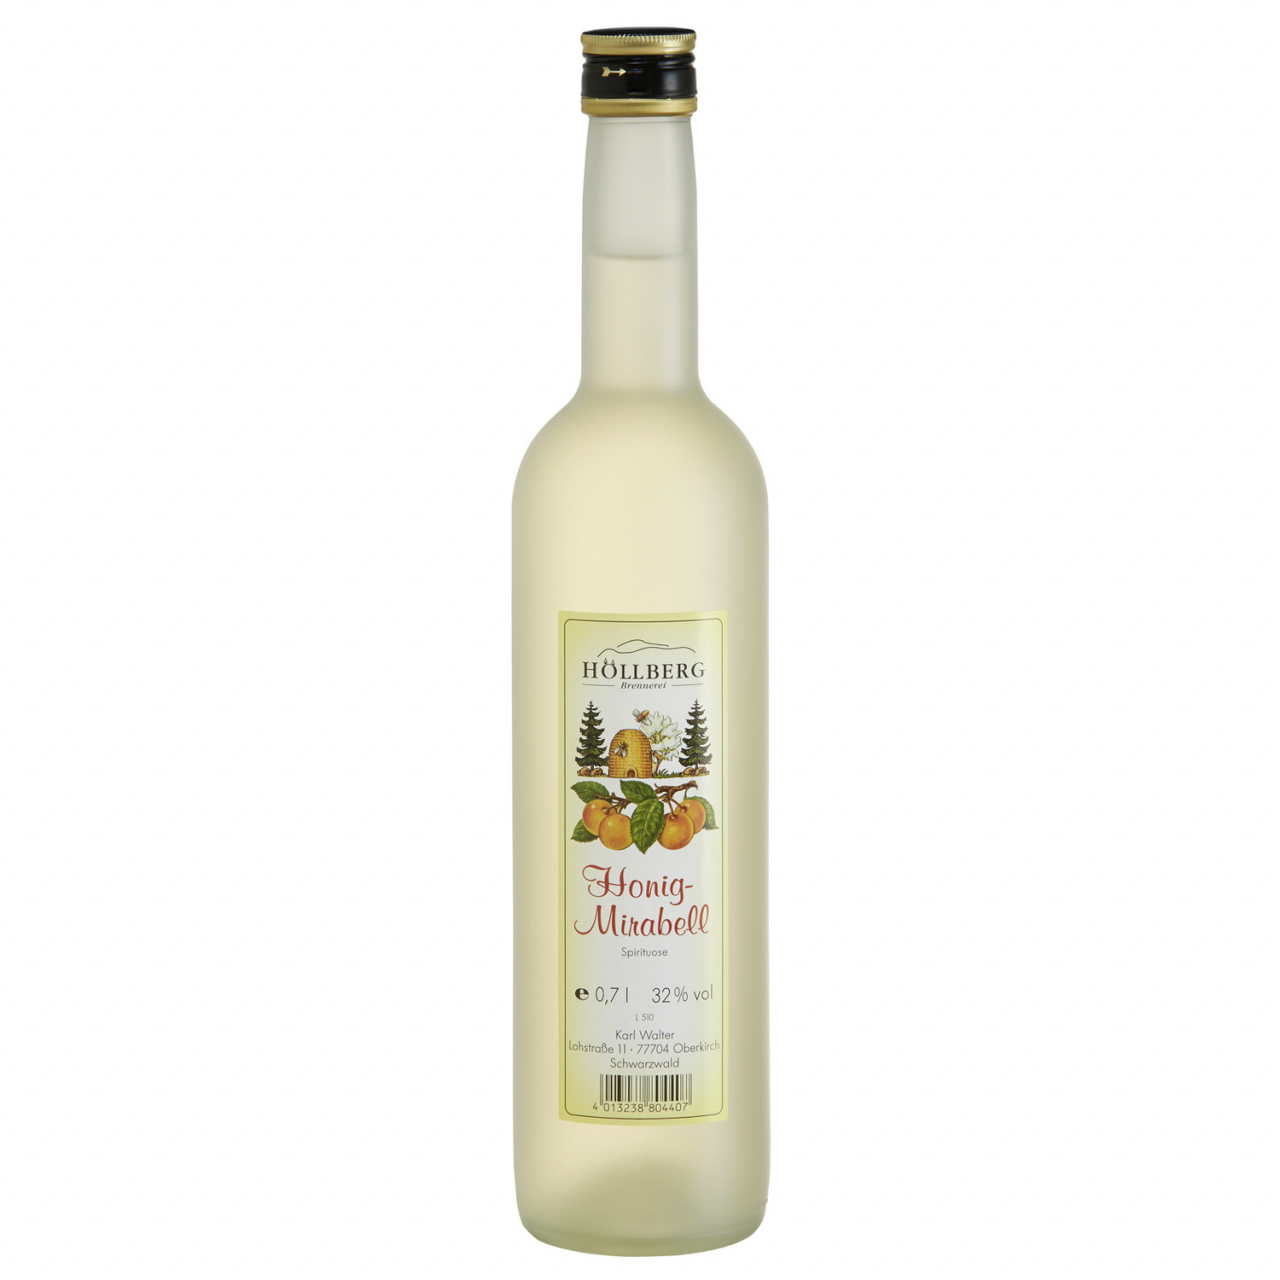 0,7 Liter Flasche Höllberg Hing Mirabelle